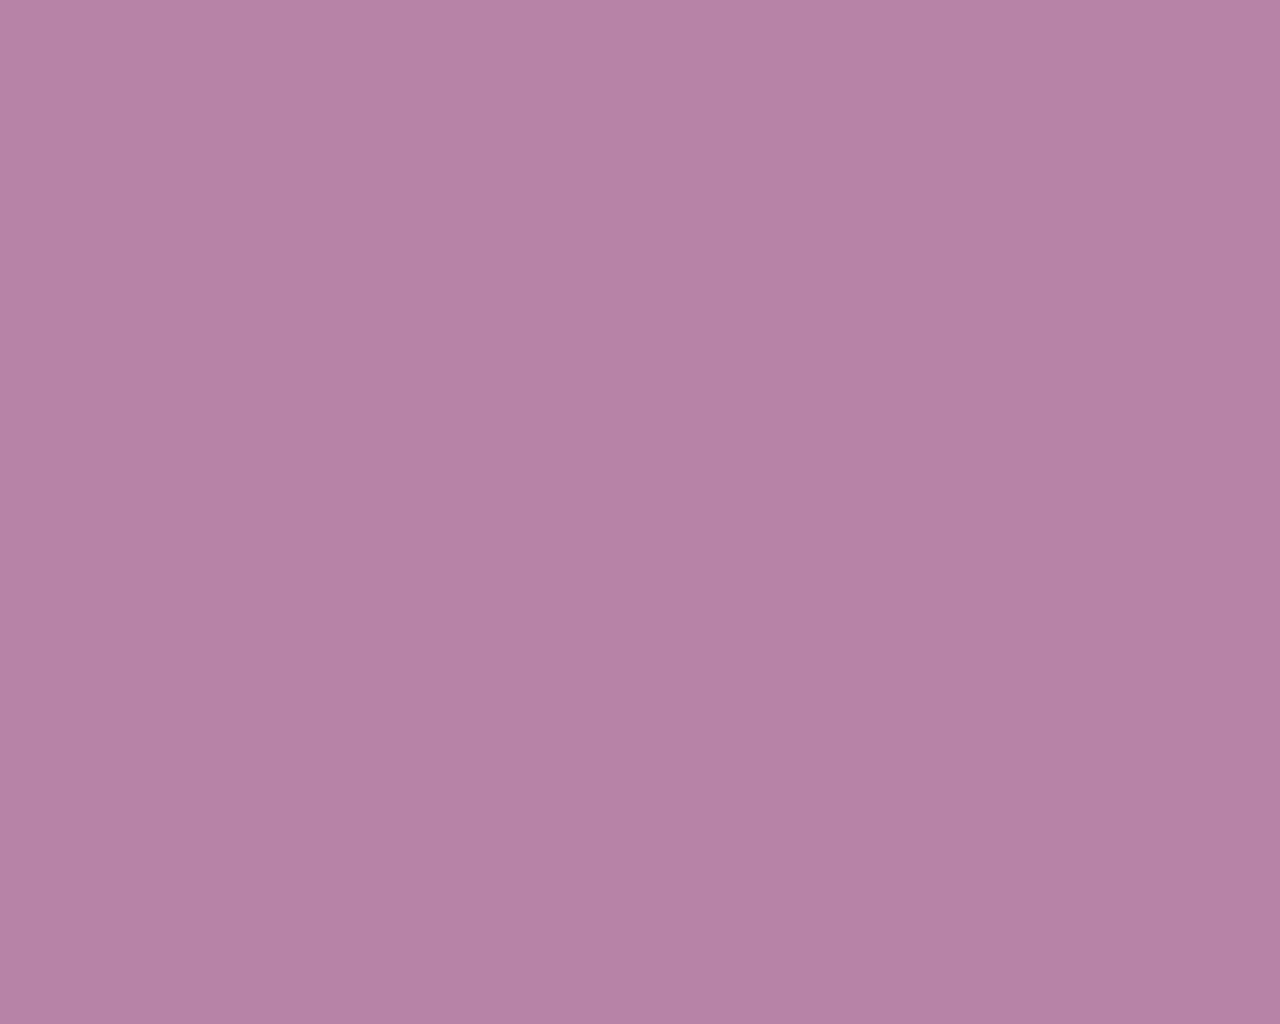 1280x1024 Opera Mauve Solid Color Background